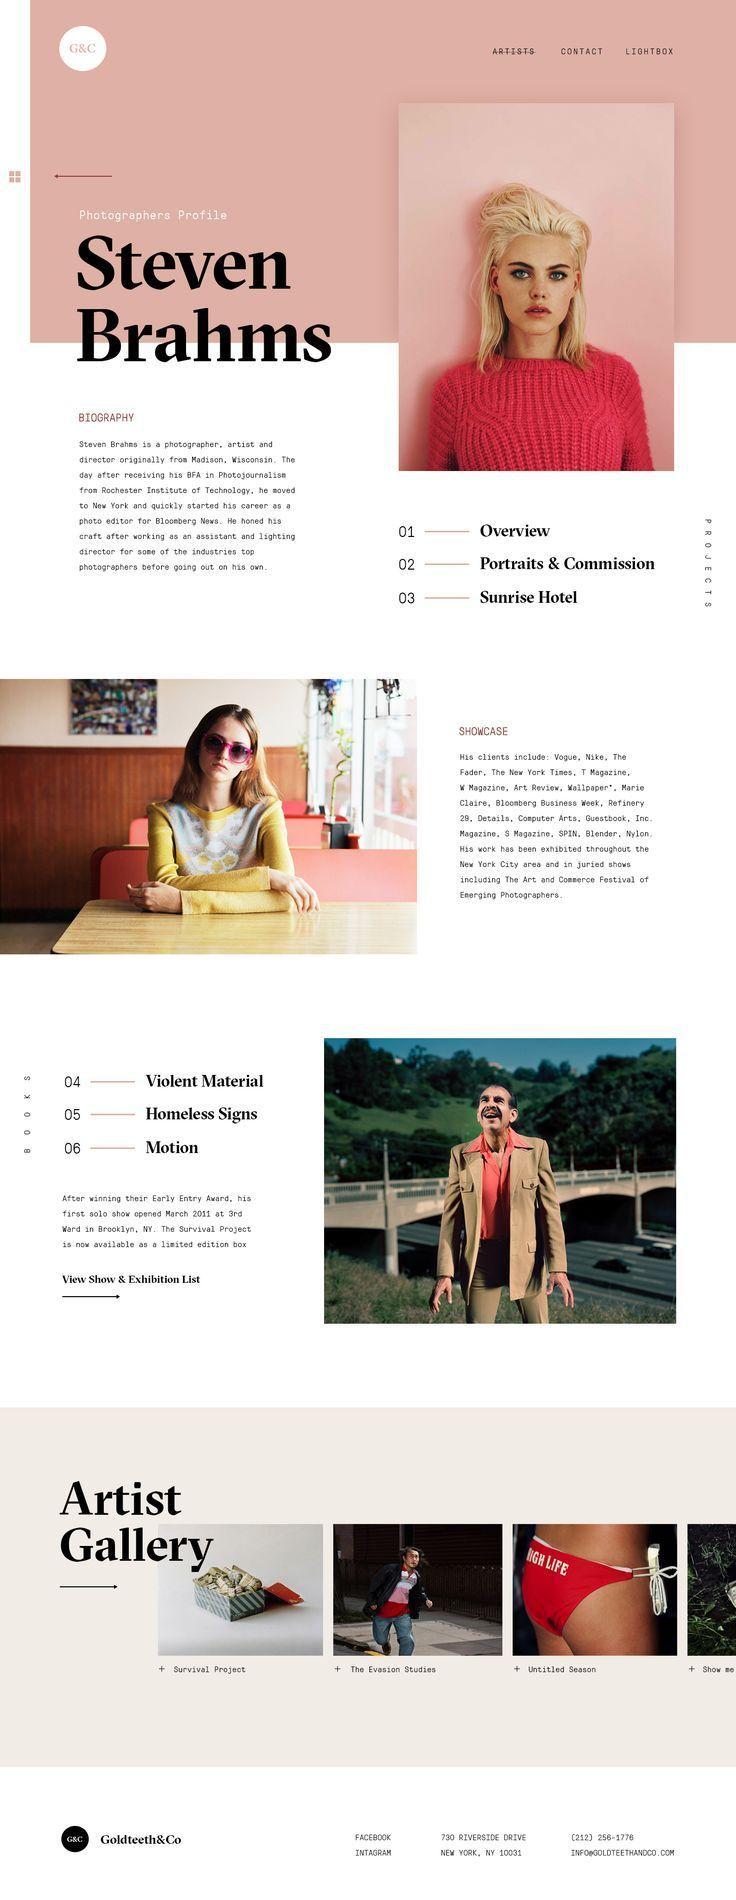 Goldteeth & CO - Ui Designkonzept für Fotografenportfolios von Marko Cvijetic. - #amp #Cvijetic #Designkonzept #Fotografenportfolios #für #Goldteeth #Marko #portfolio #Ui #von #guidesign